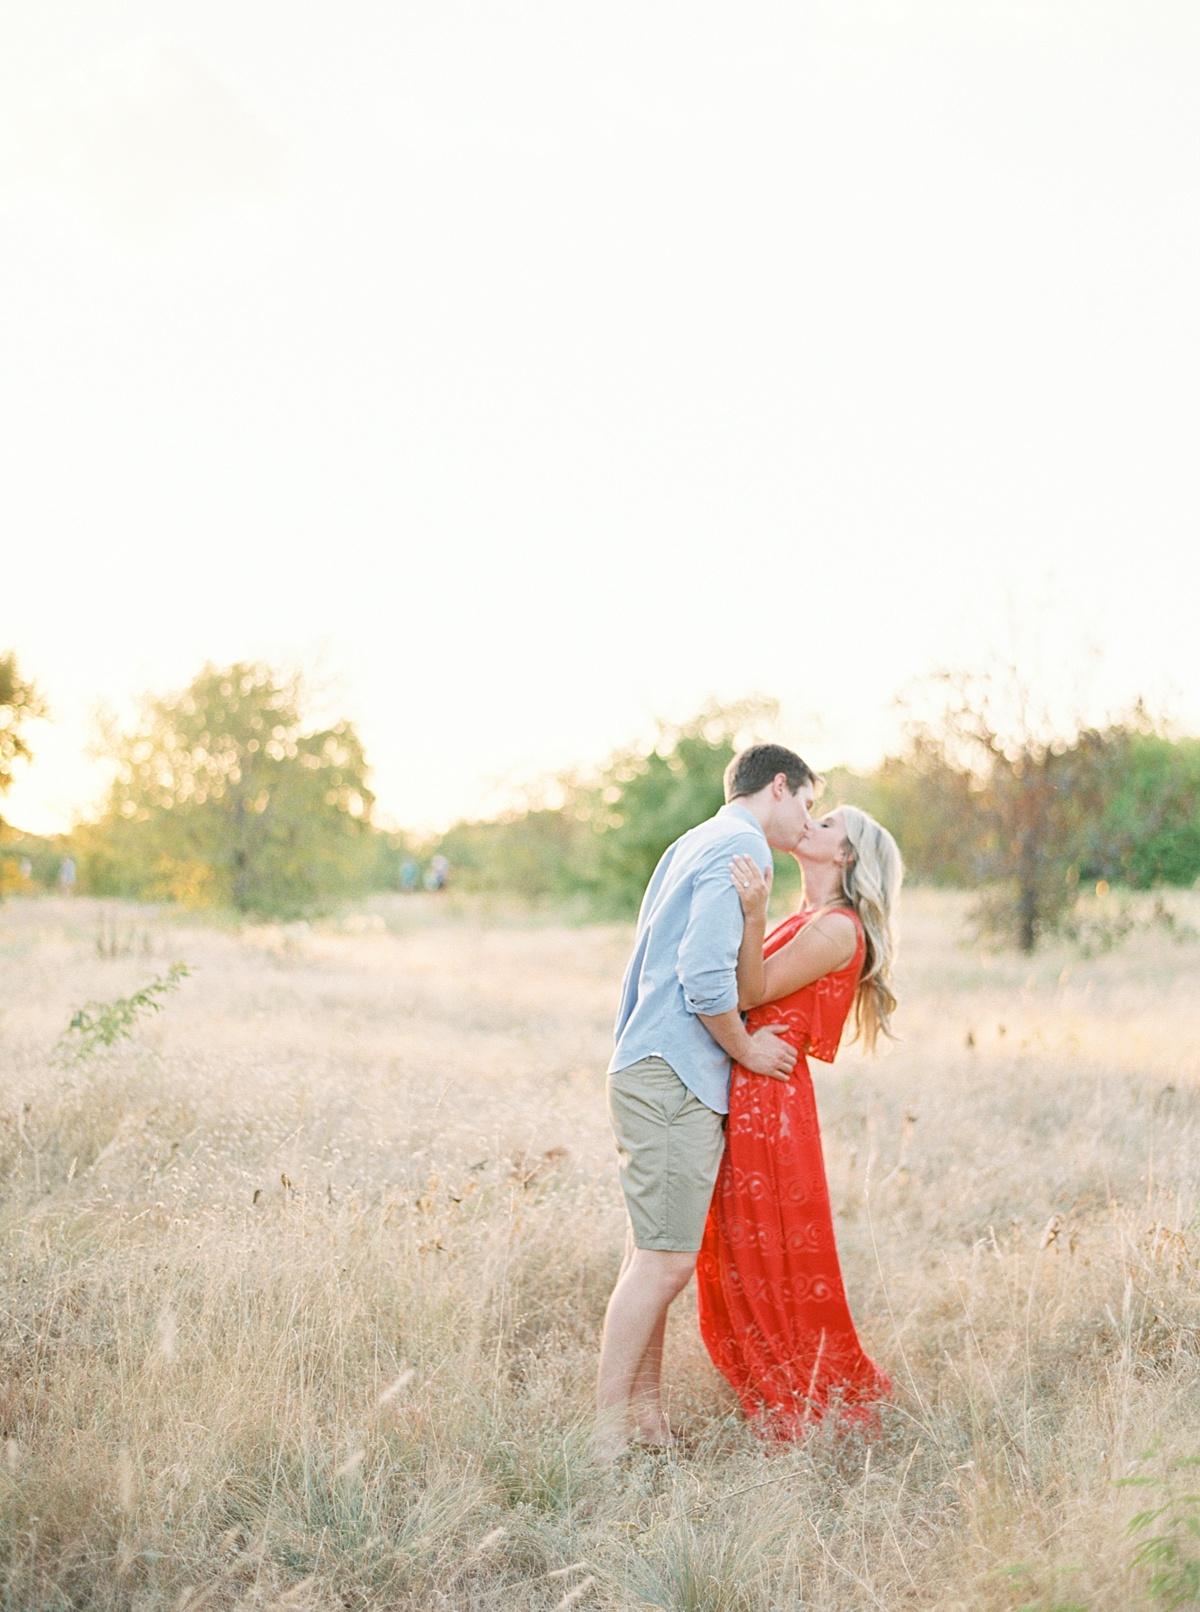 Stylish Dallas Engagement Session - Lindsey Brunk